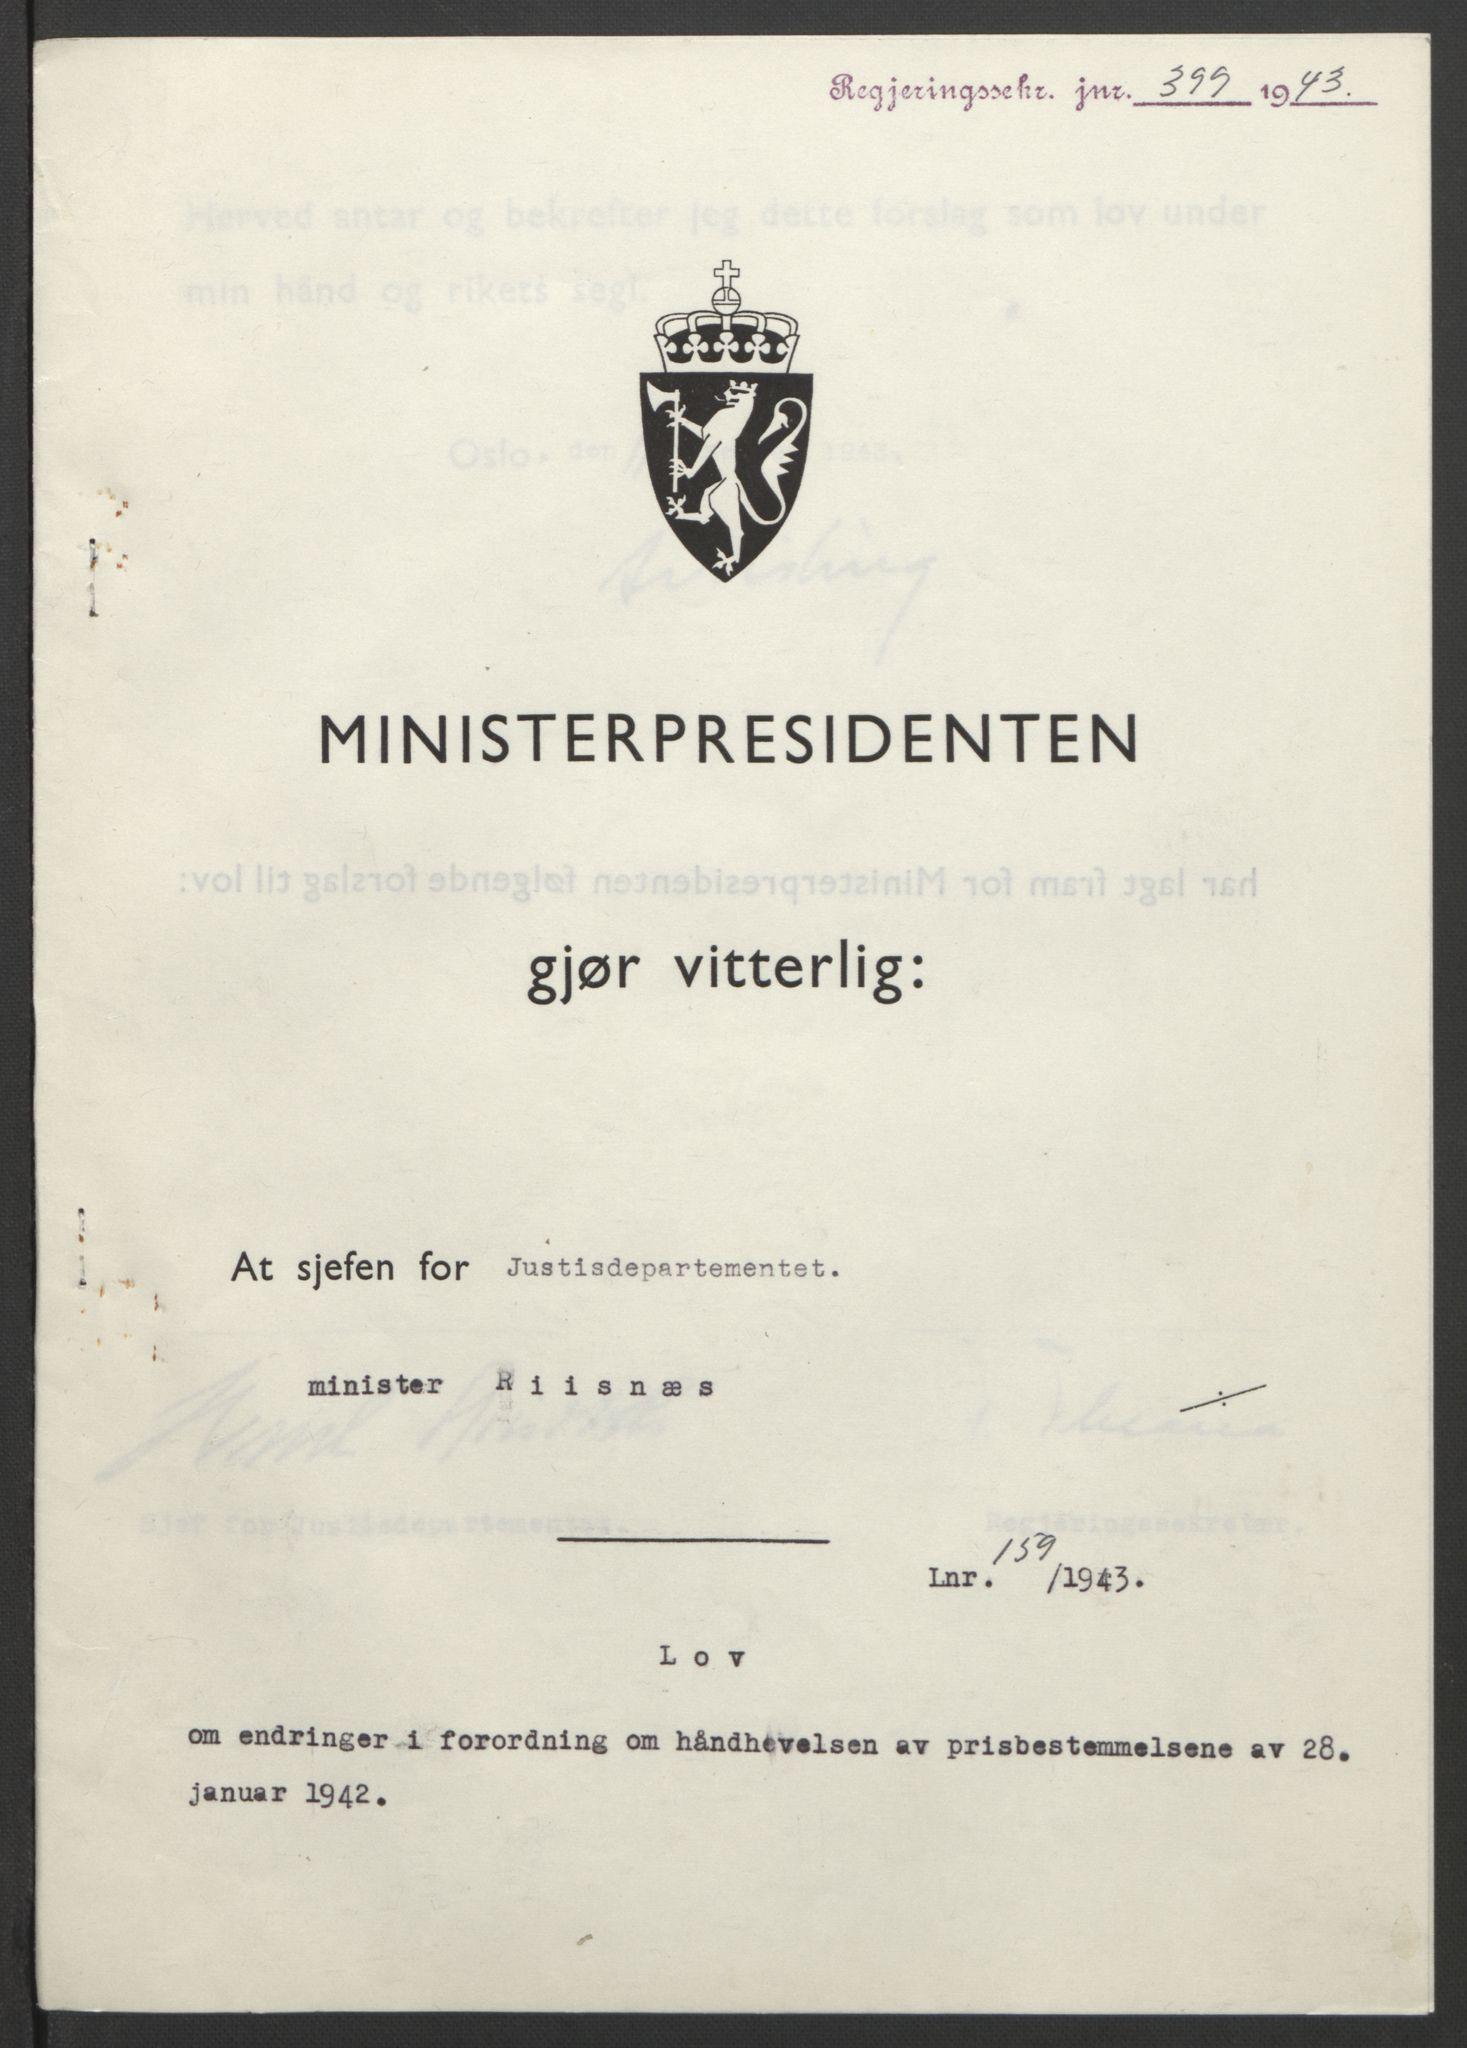 RA, NS-administrasjonen 1940-1945 (Statsrådsekretariatet, de kommisariske statsråder mm), D/Db/L0099: Lover, 1943, s. 753